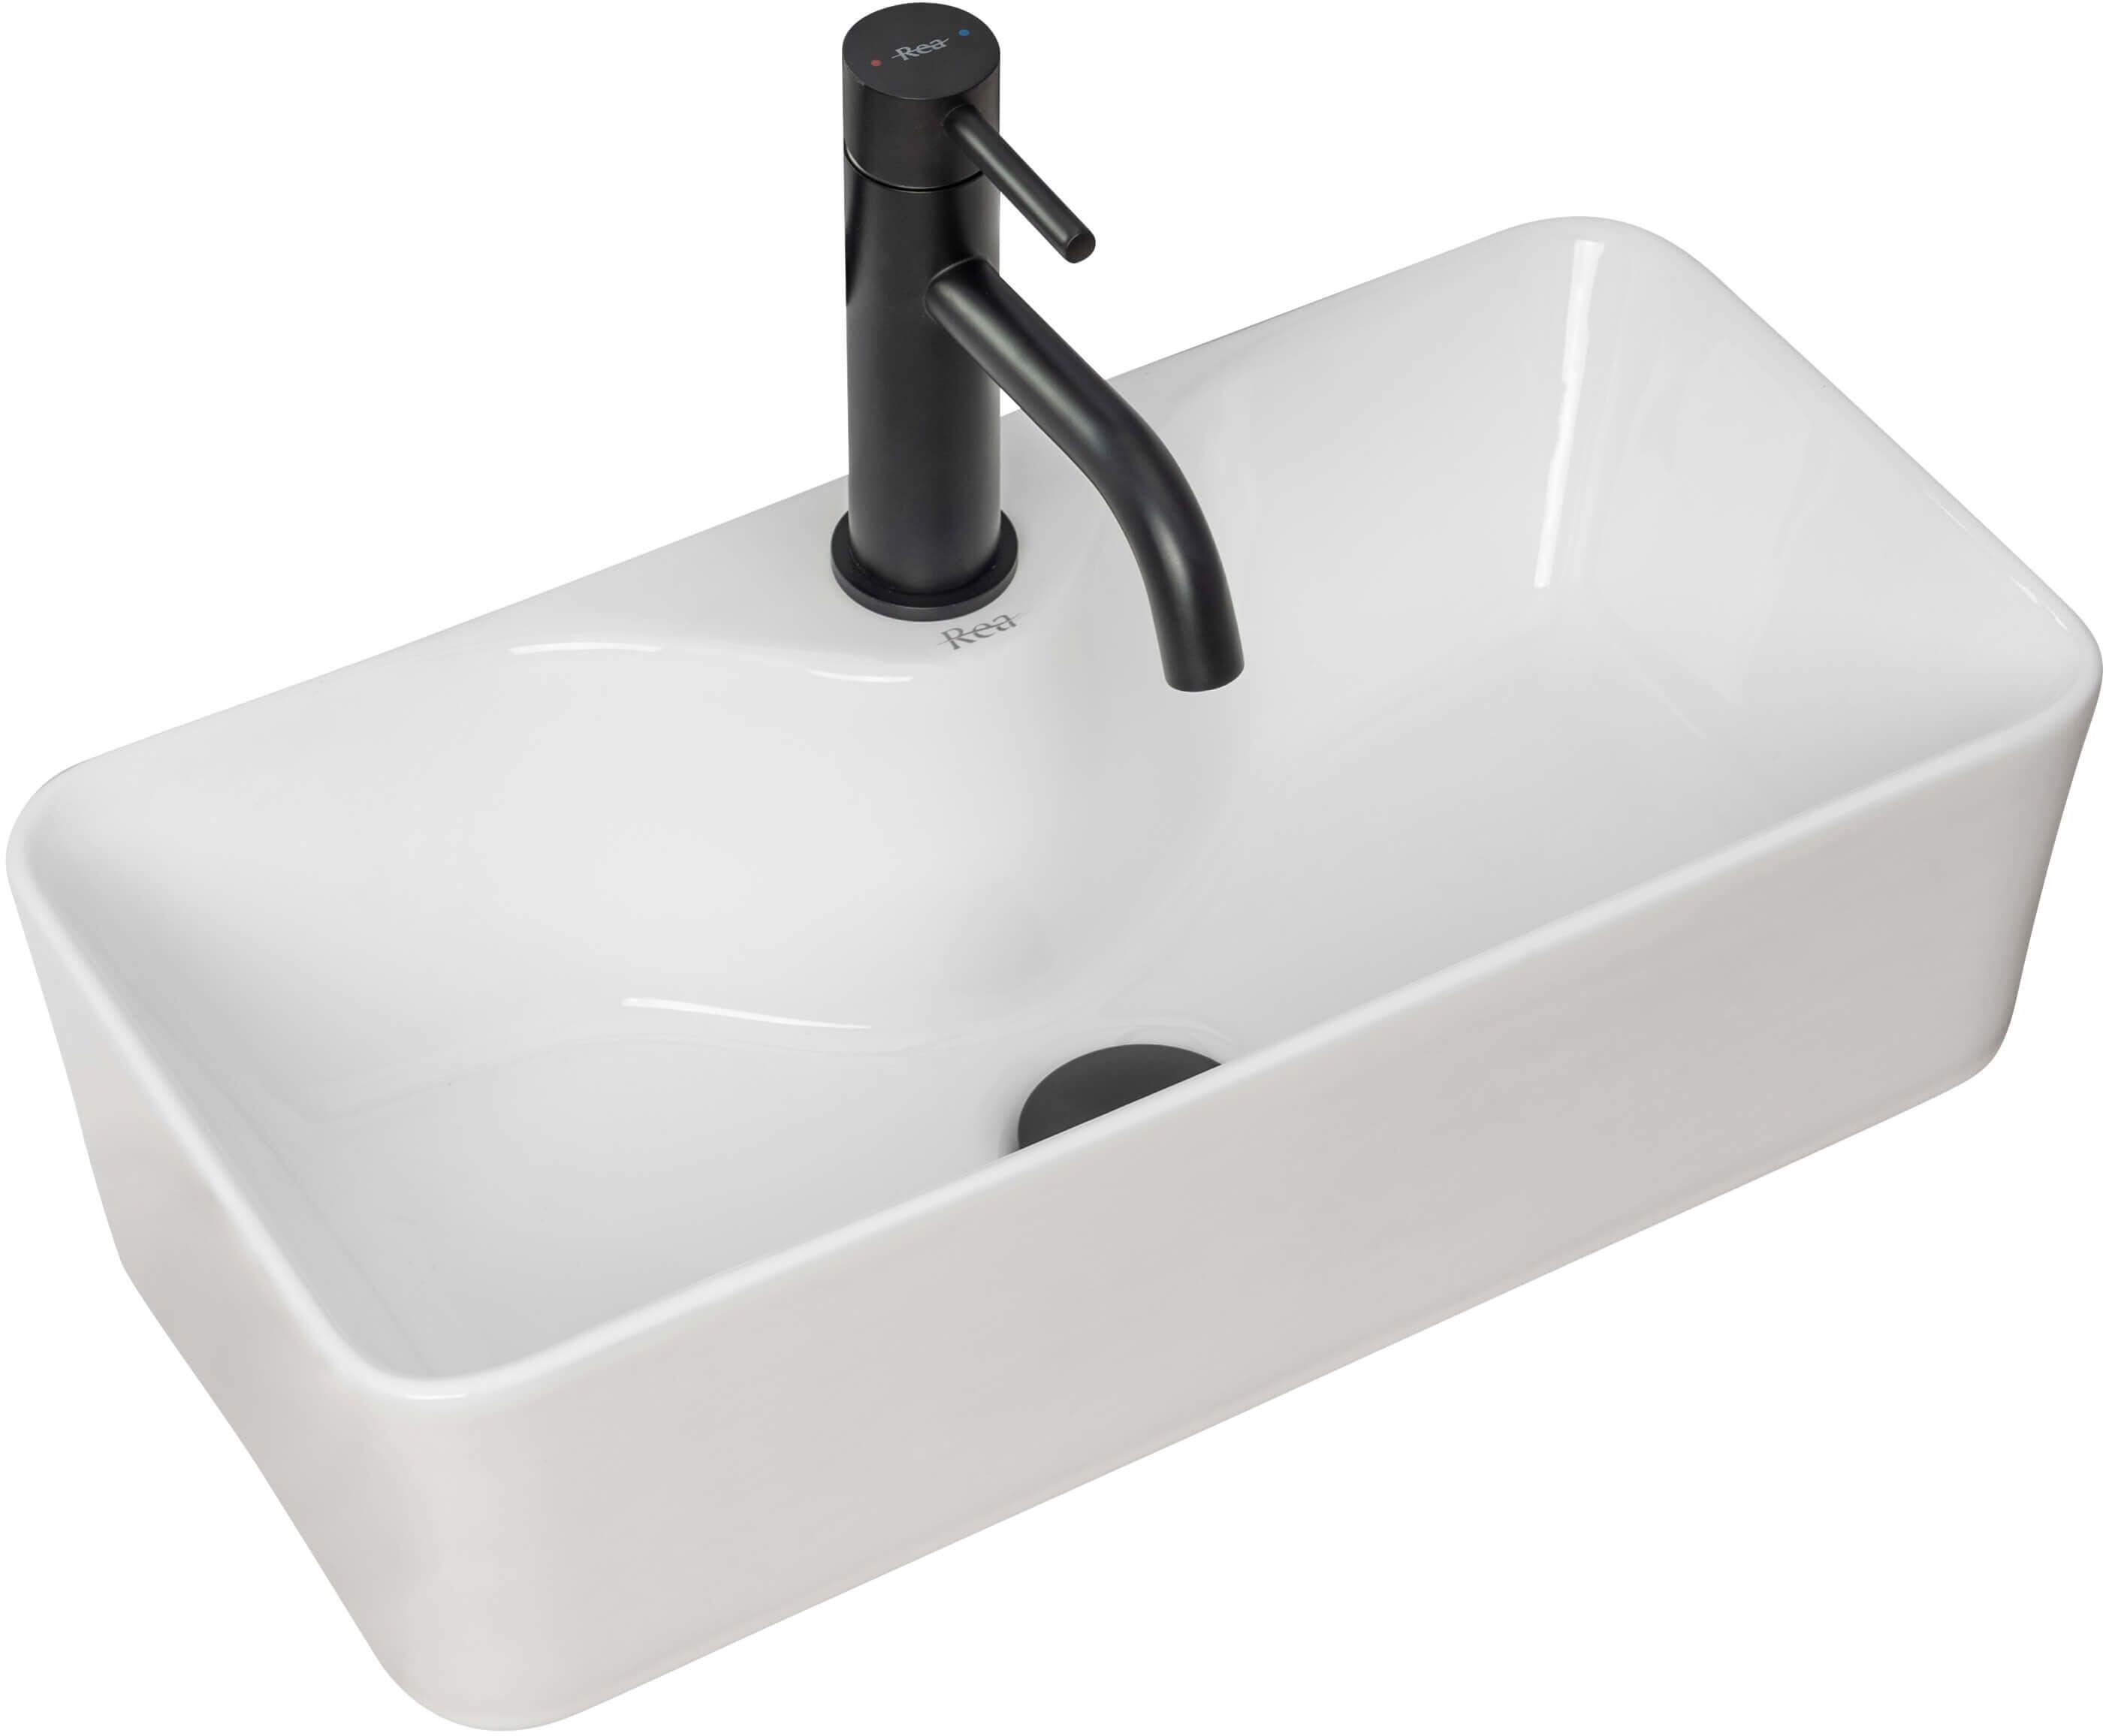 Umywalka nablatowa 50 Mery Rea (REA-U0699)